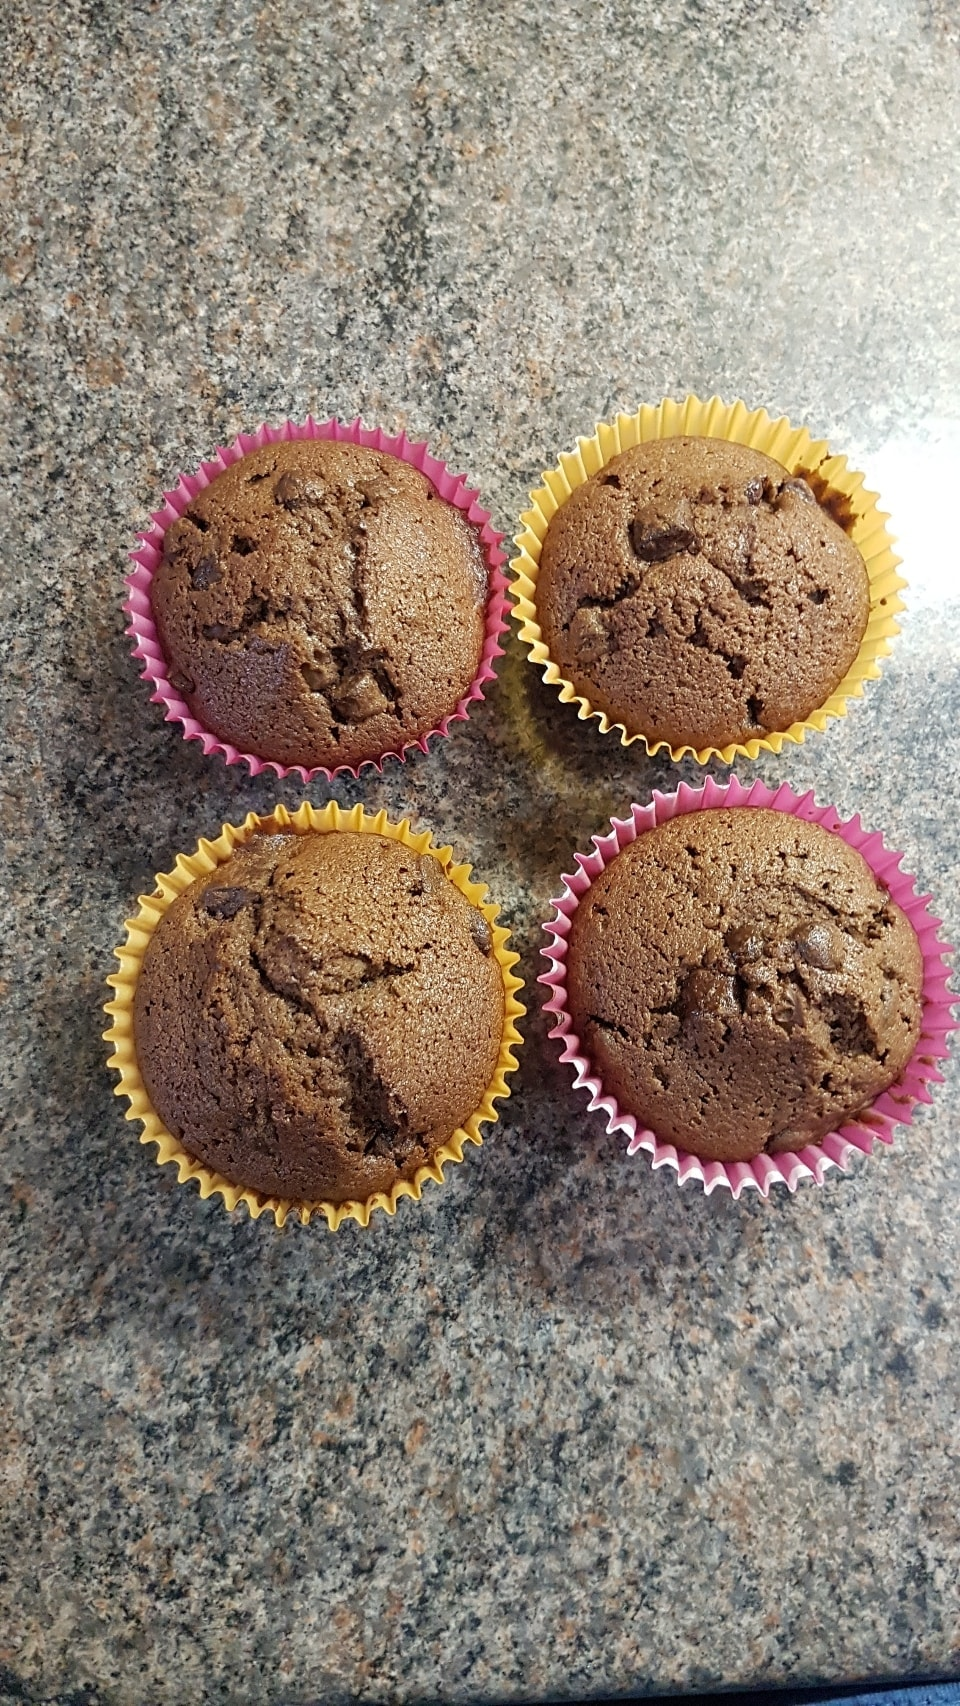 Four chocolate chip cupcakes